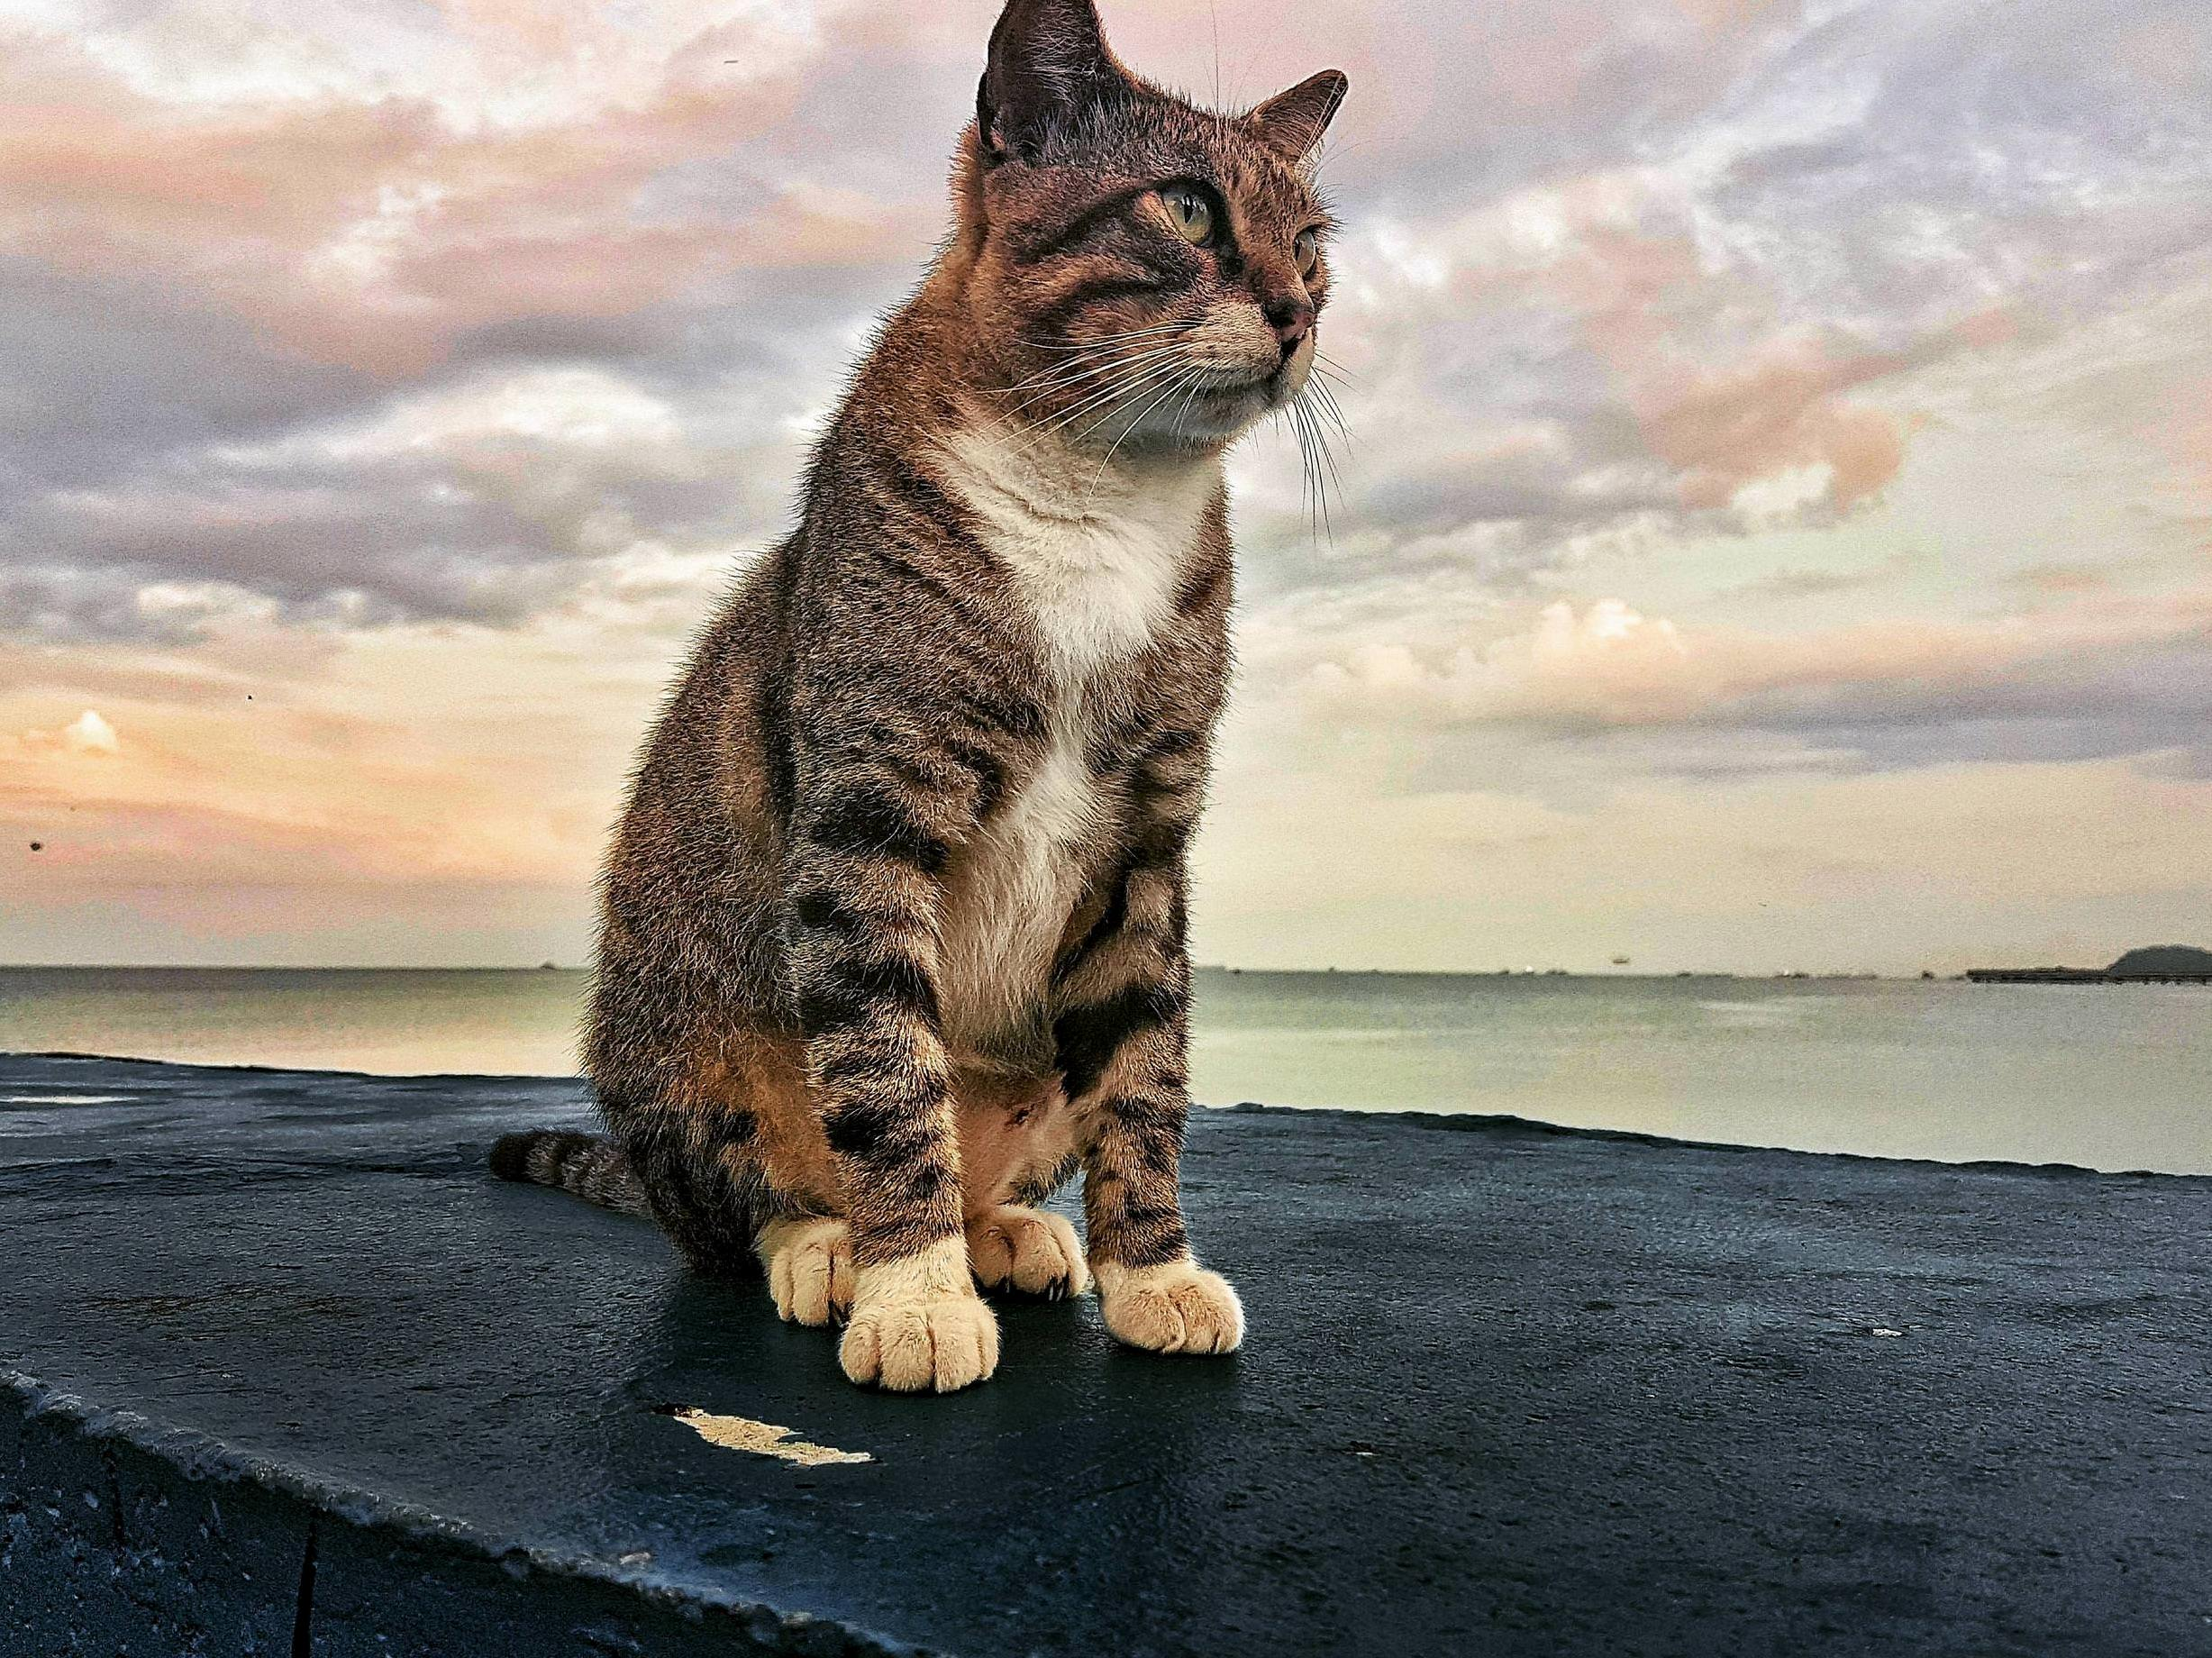 Street kitty gazing into the distance (oc)